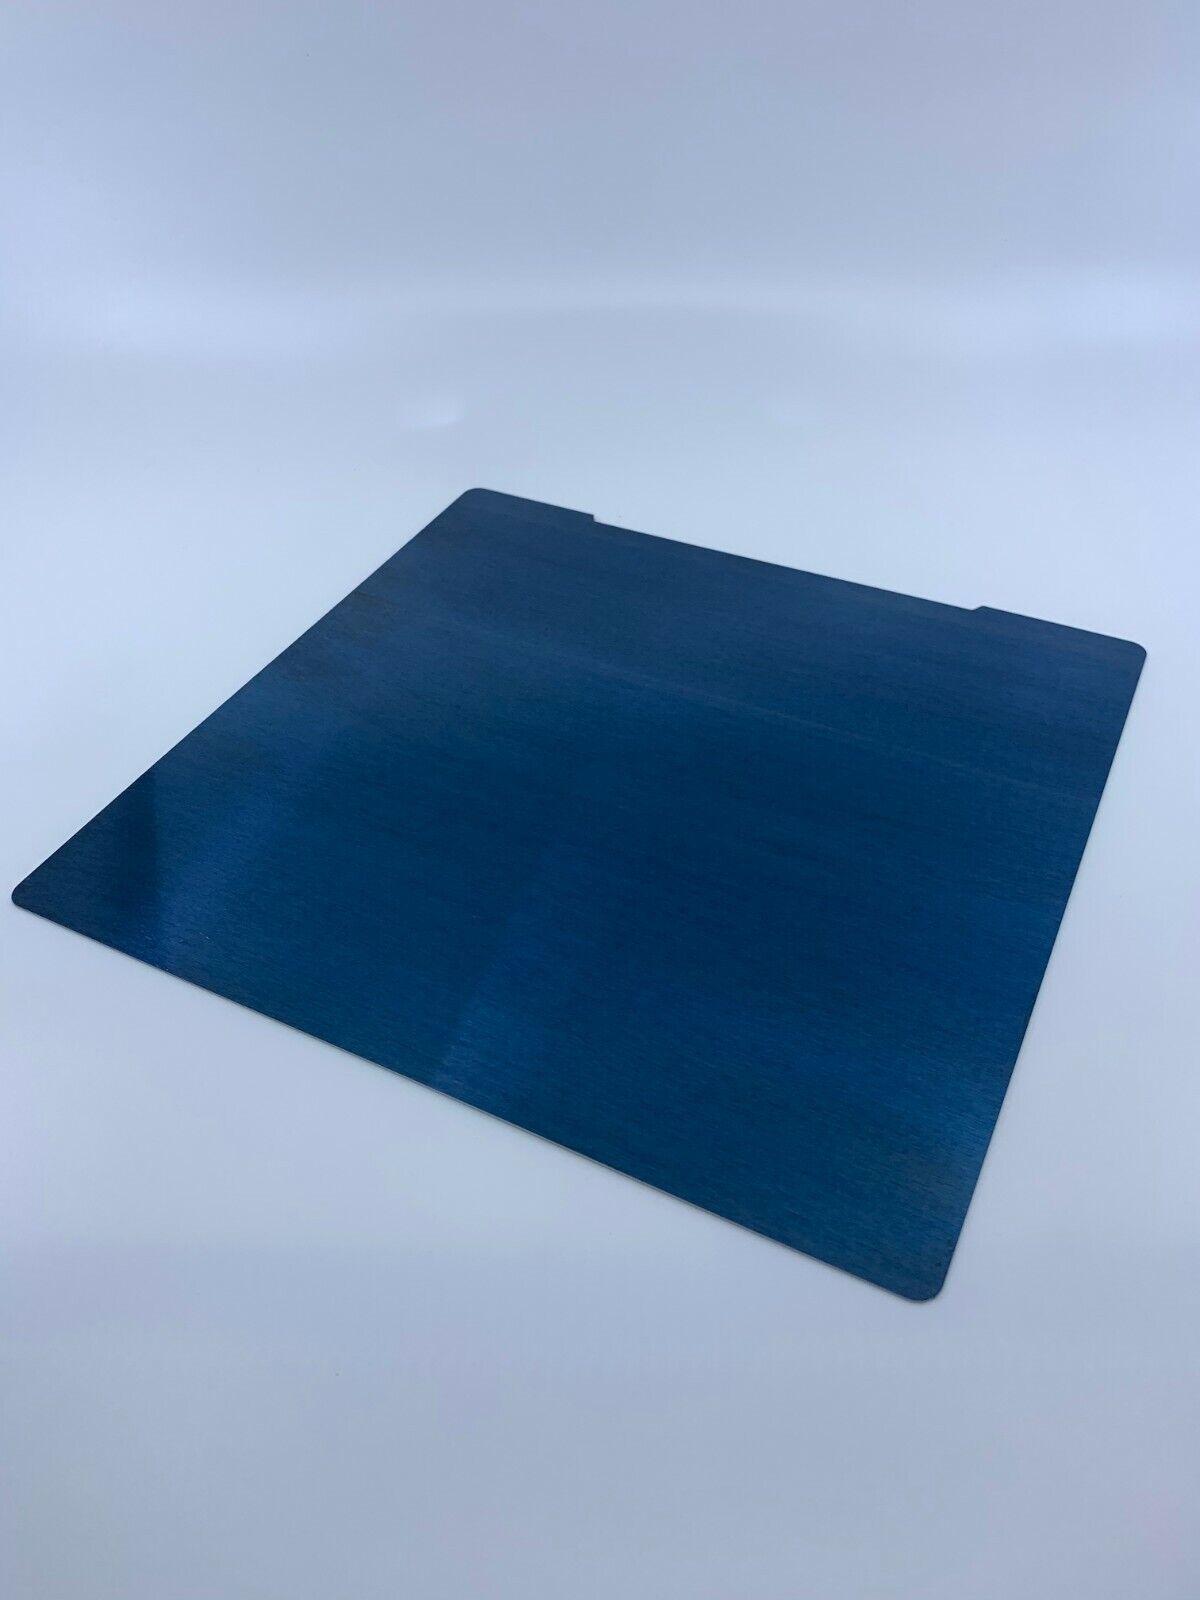 Prusa i3 MK52 Removable Blank Build Plate Spring Steel Surface MK3 MK2.5 USA